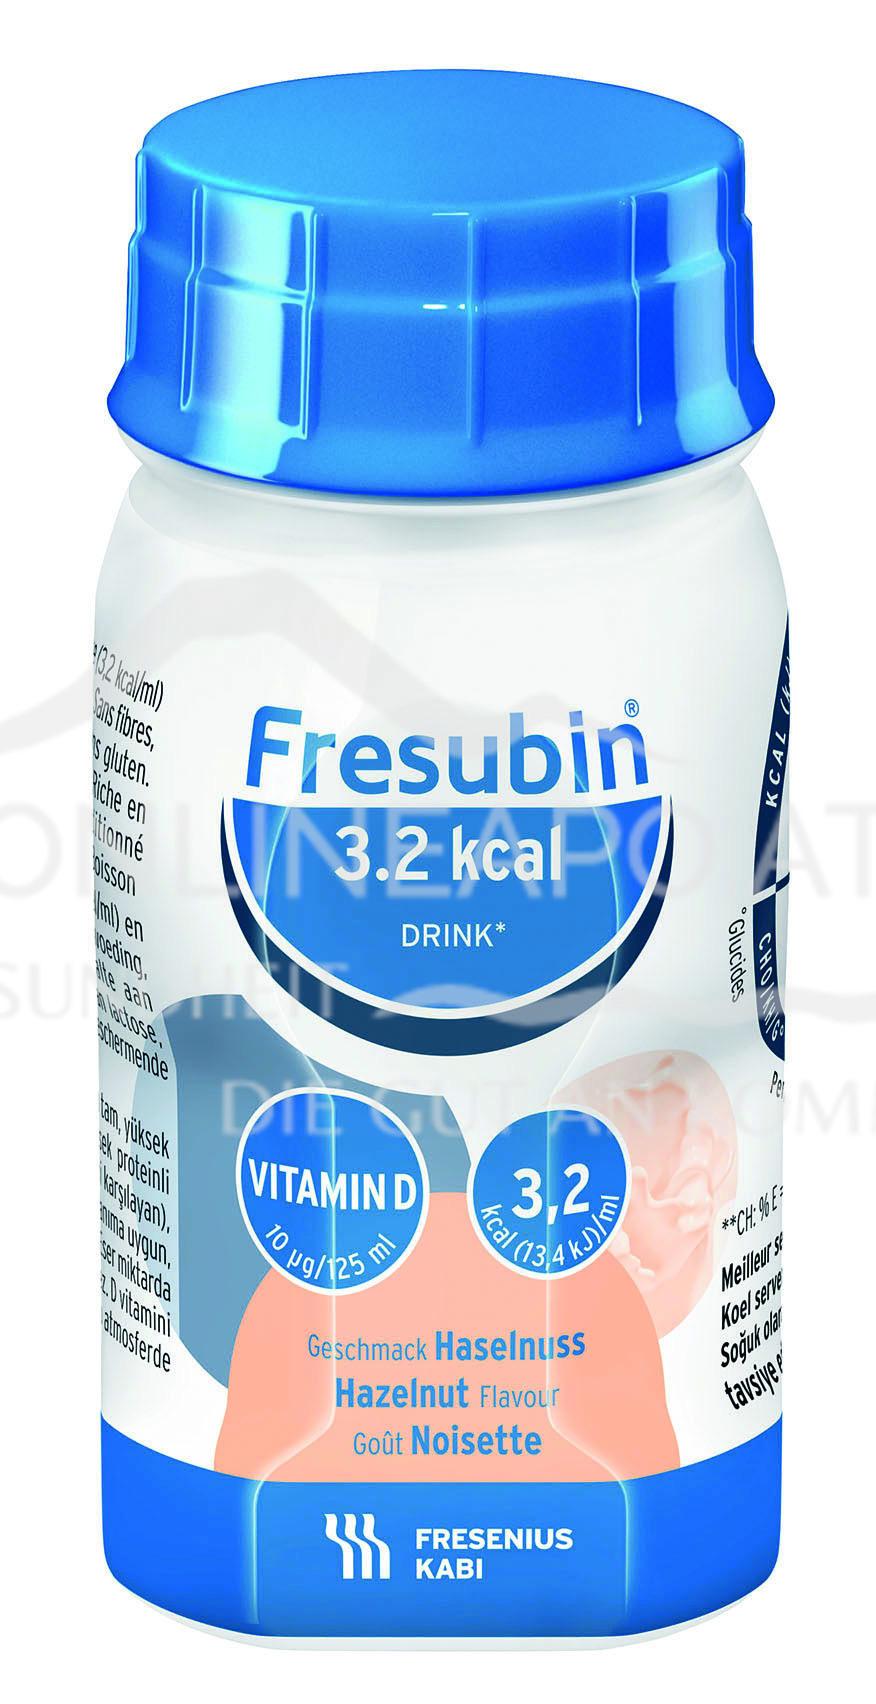 Fresubin® 3.2 kcal DRINK Haselnuss